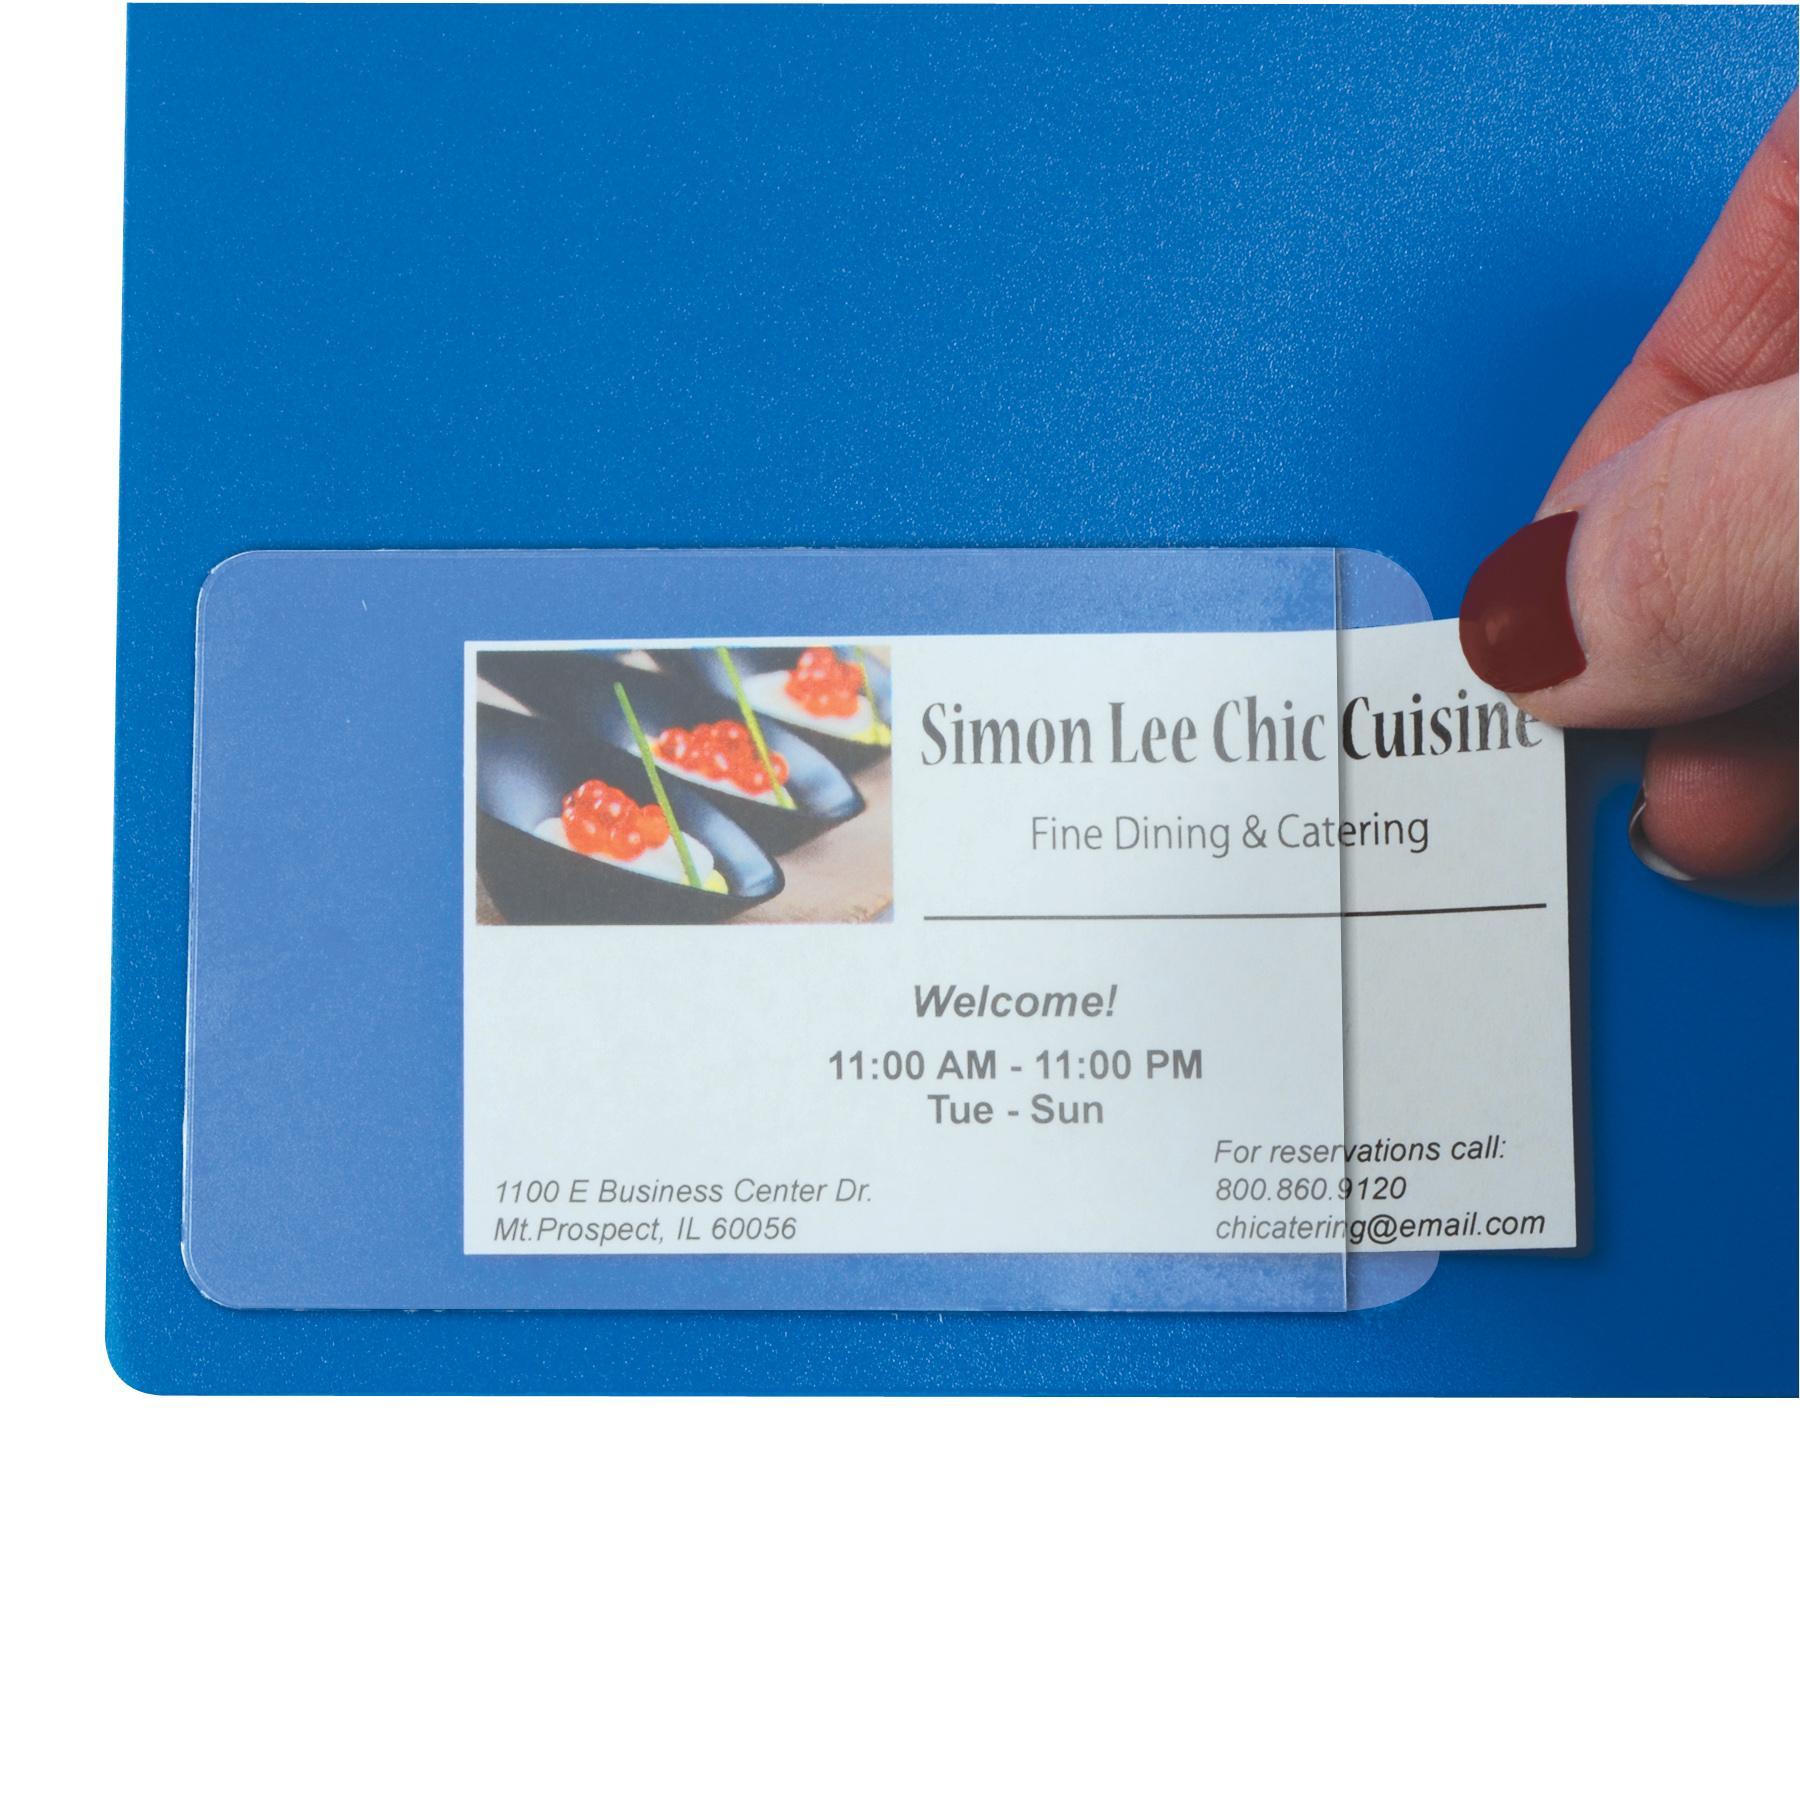 Amazon.com : C-Line Self-Adhesive Binder Label Holders For